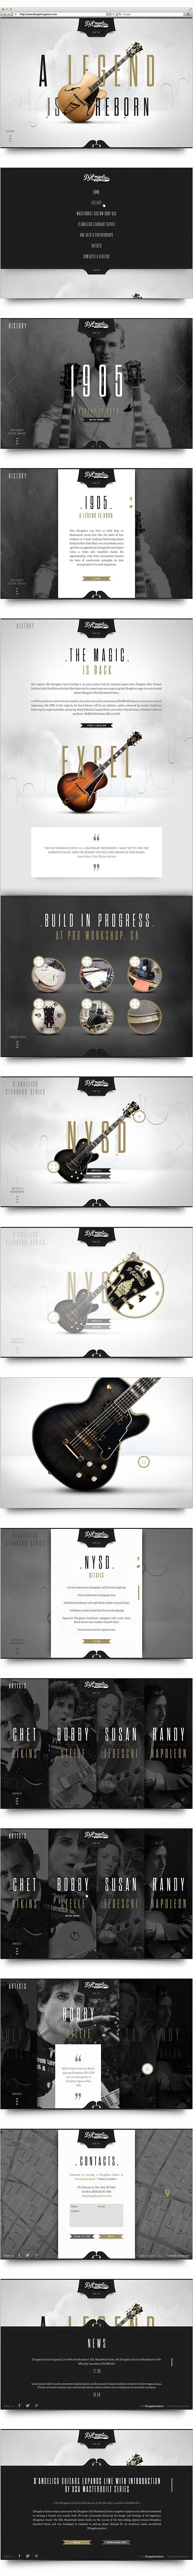 D'Angelico Guitars by Stella Petkova